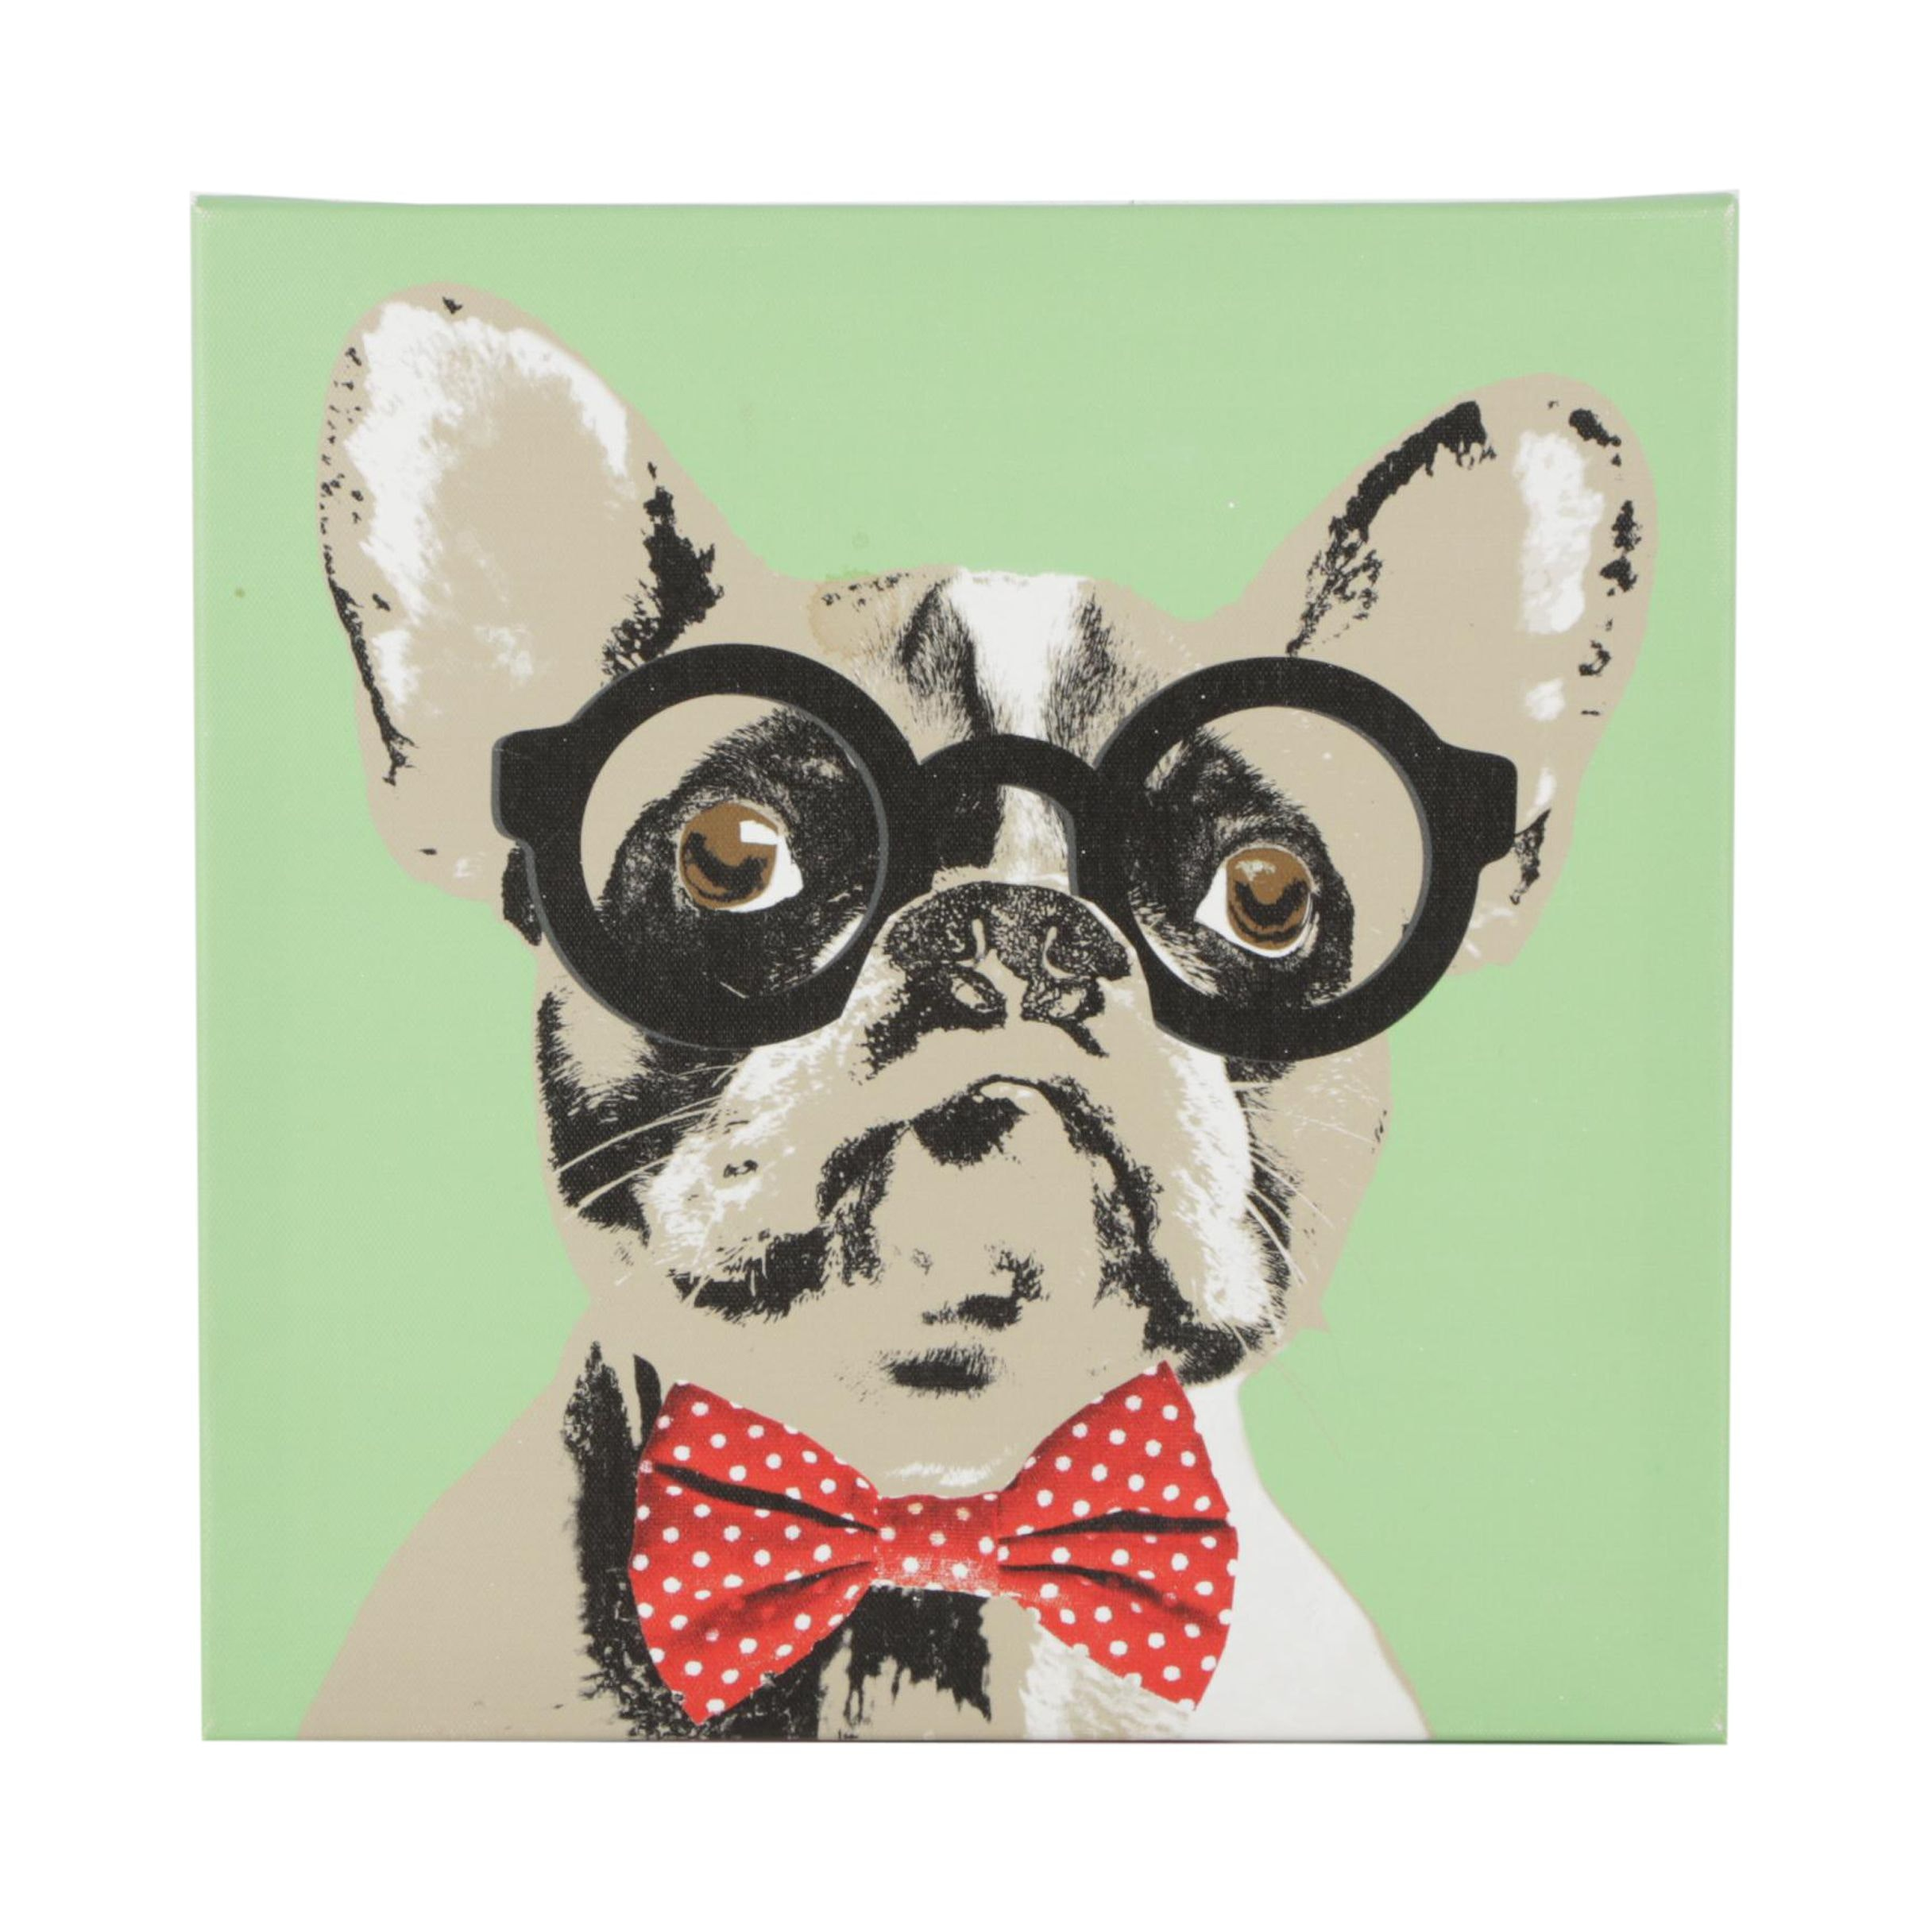 Giclee Print of Boston Terrier